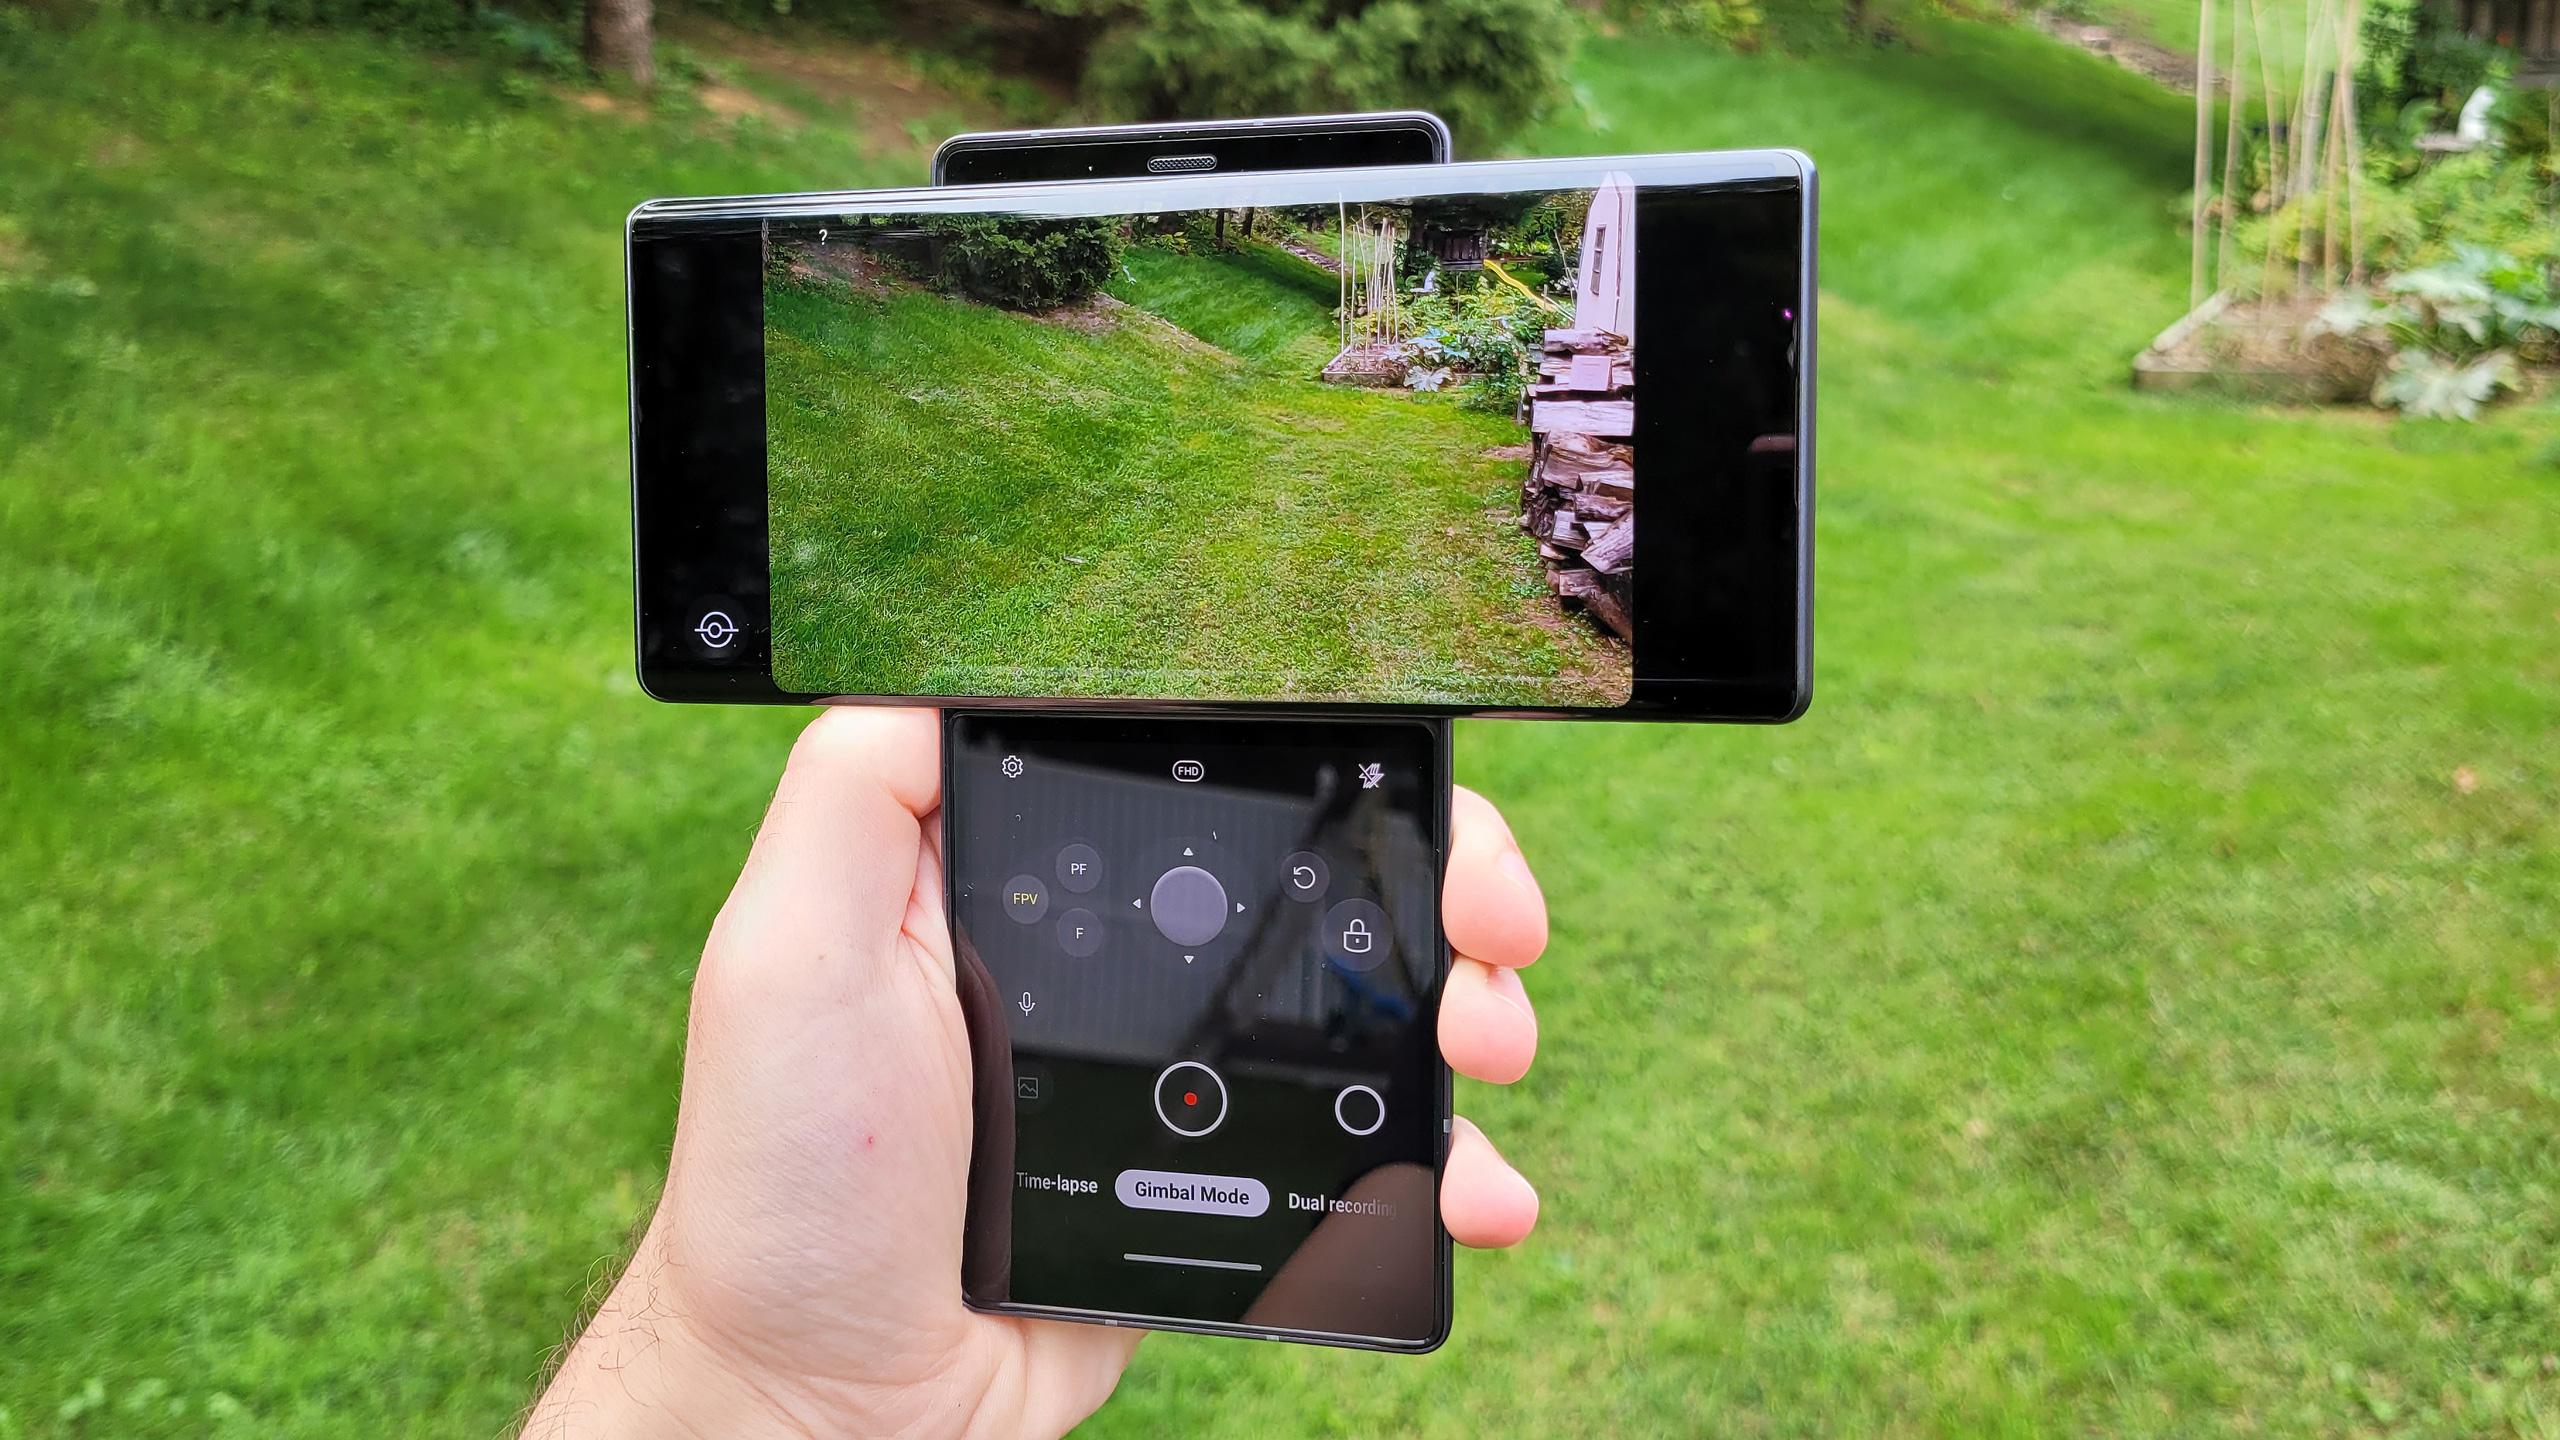 Best foldable phones: LG Wing